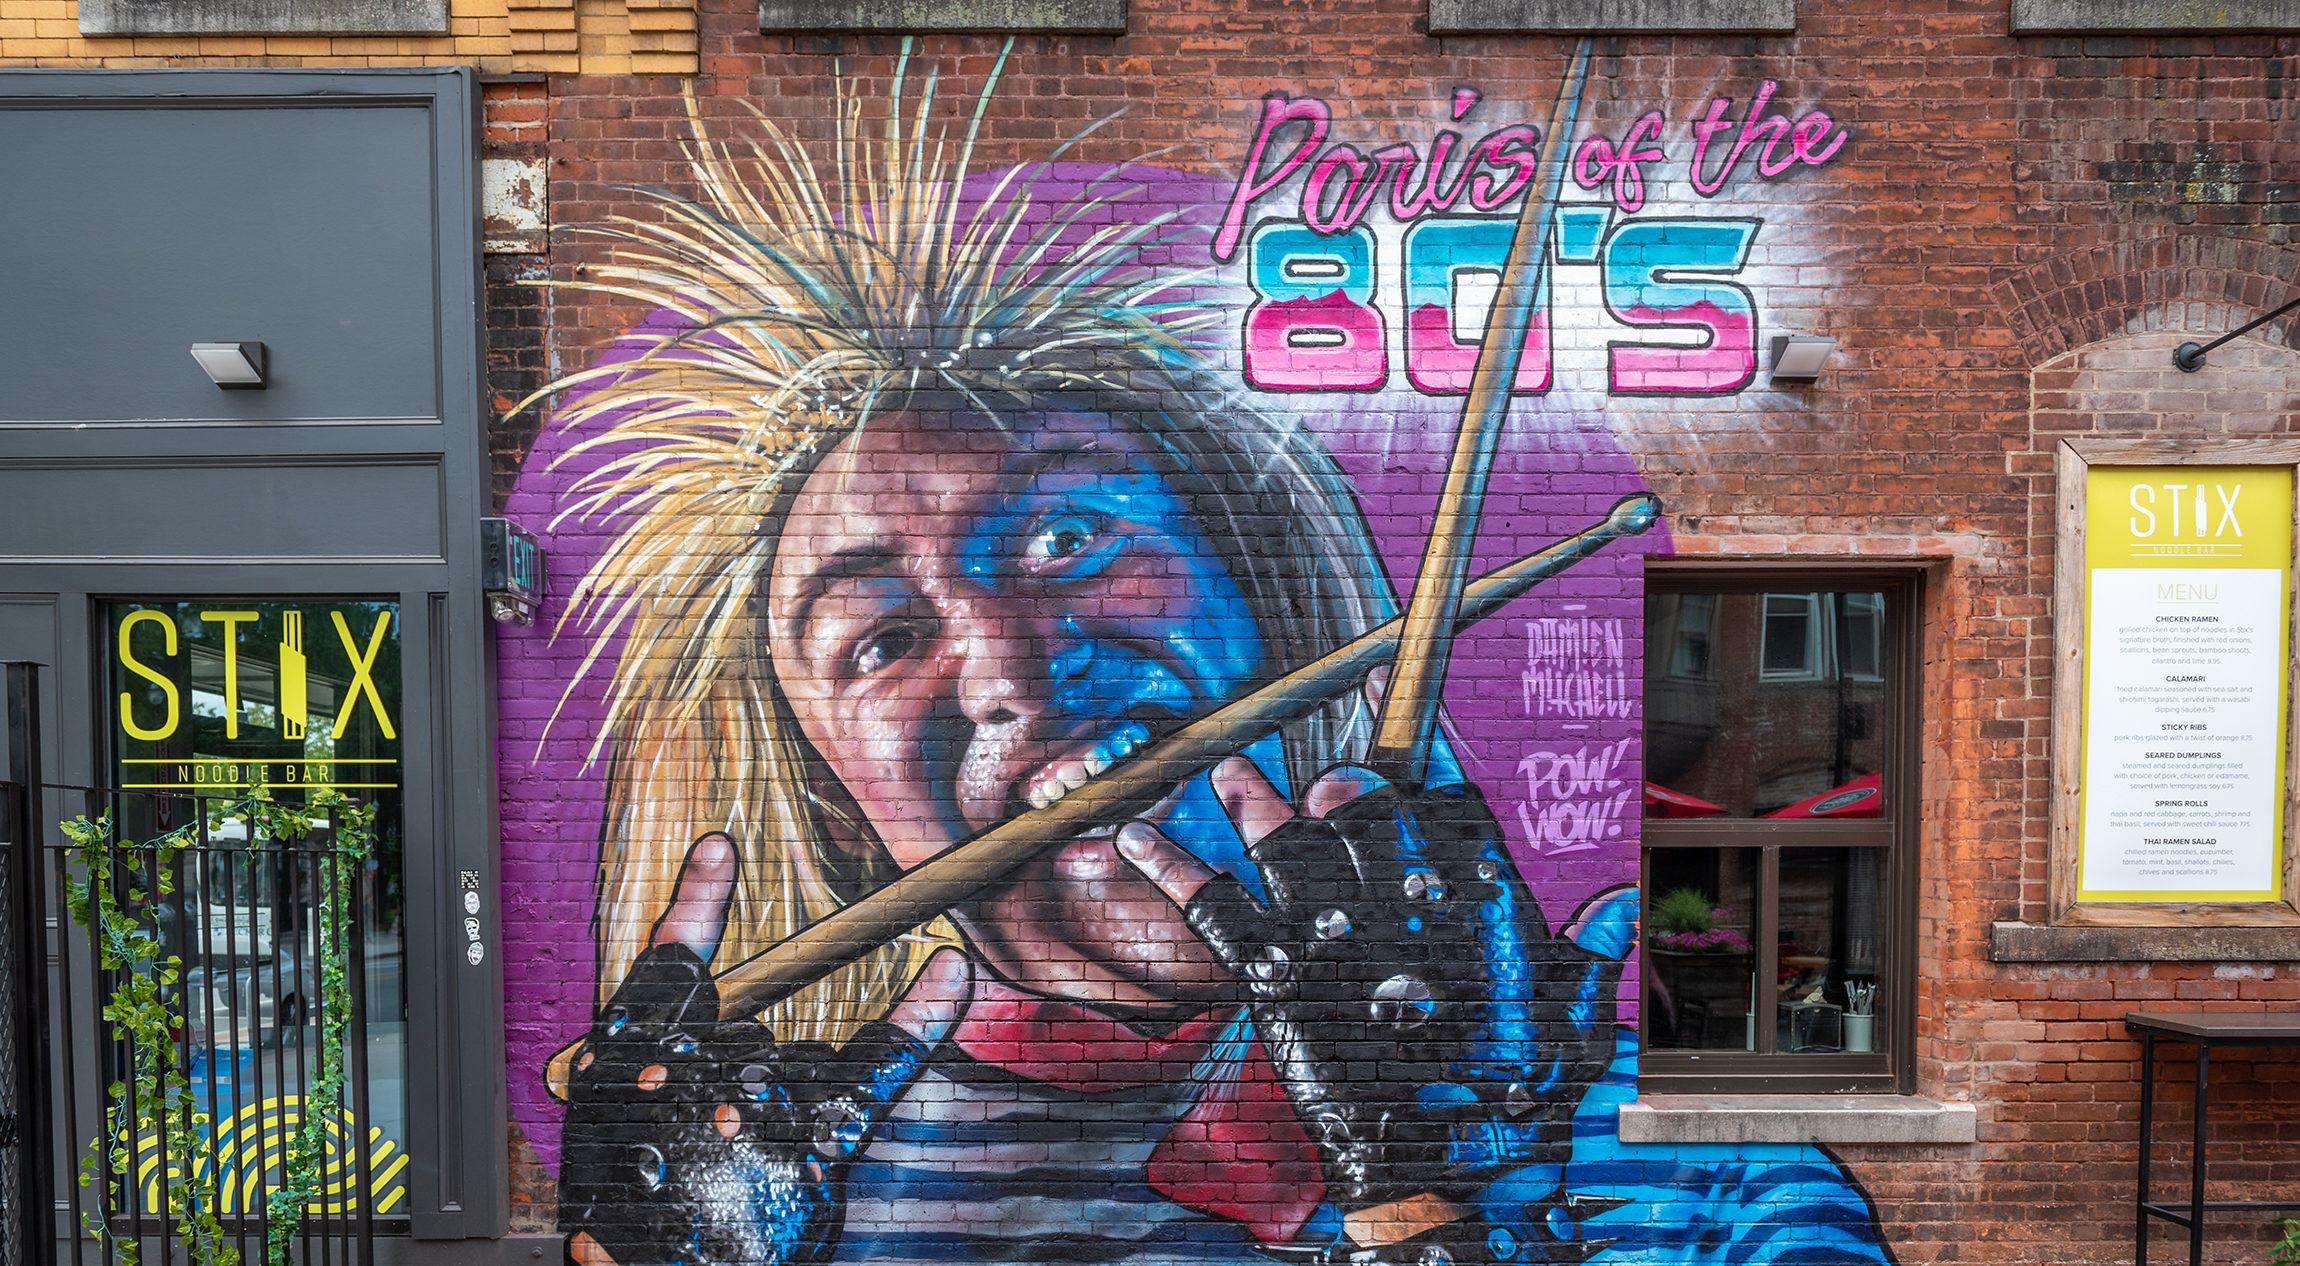 Mural of punk rocker on brick wall